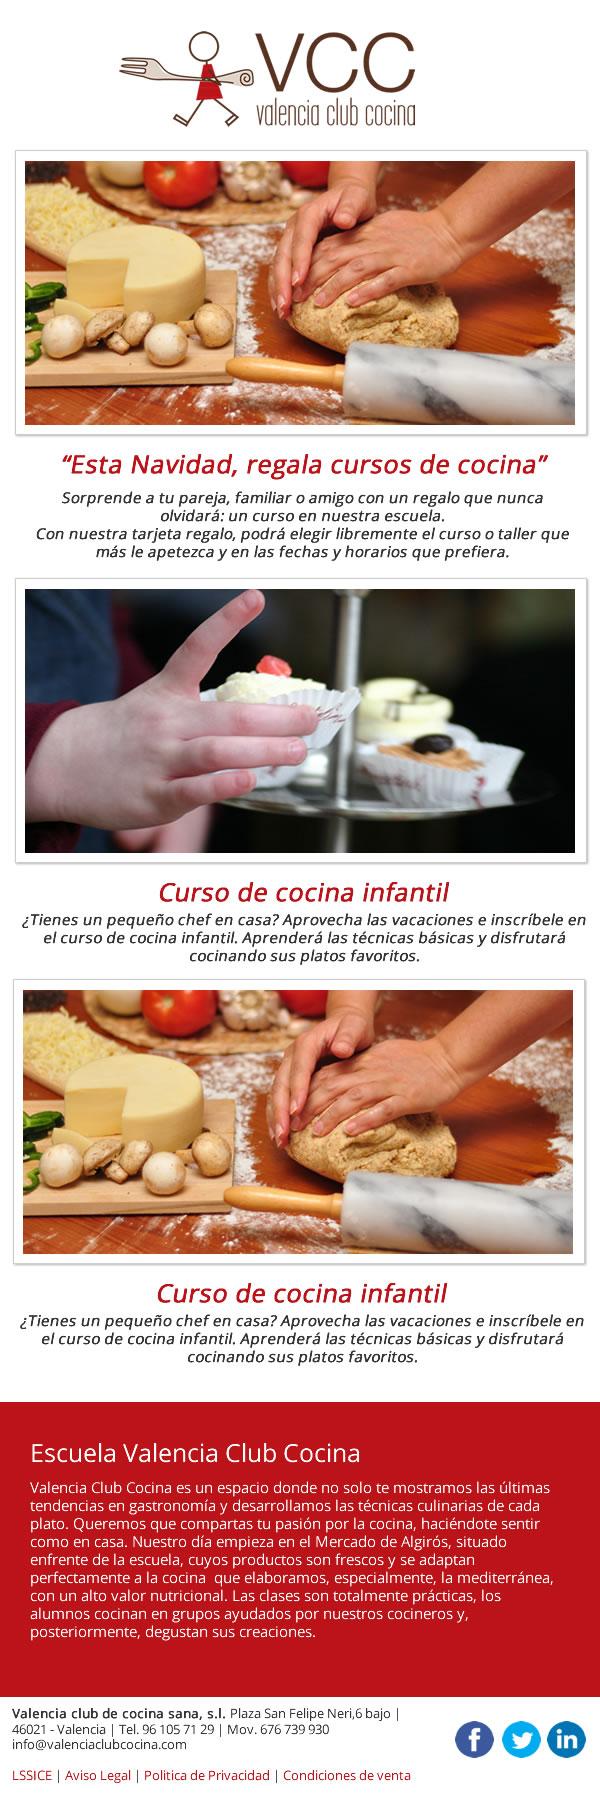 Diseño de newsletter para Valencia Club Cocina